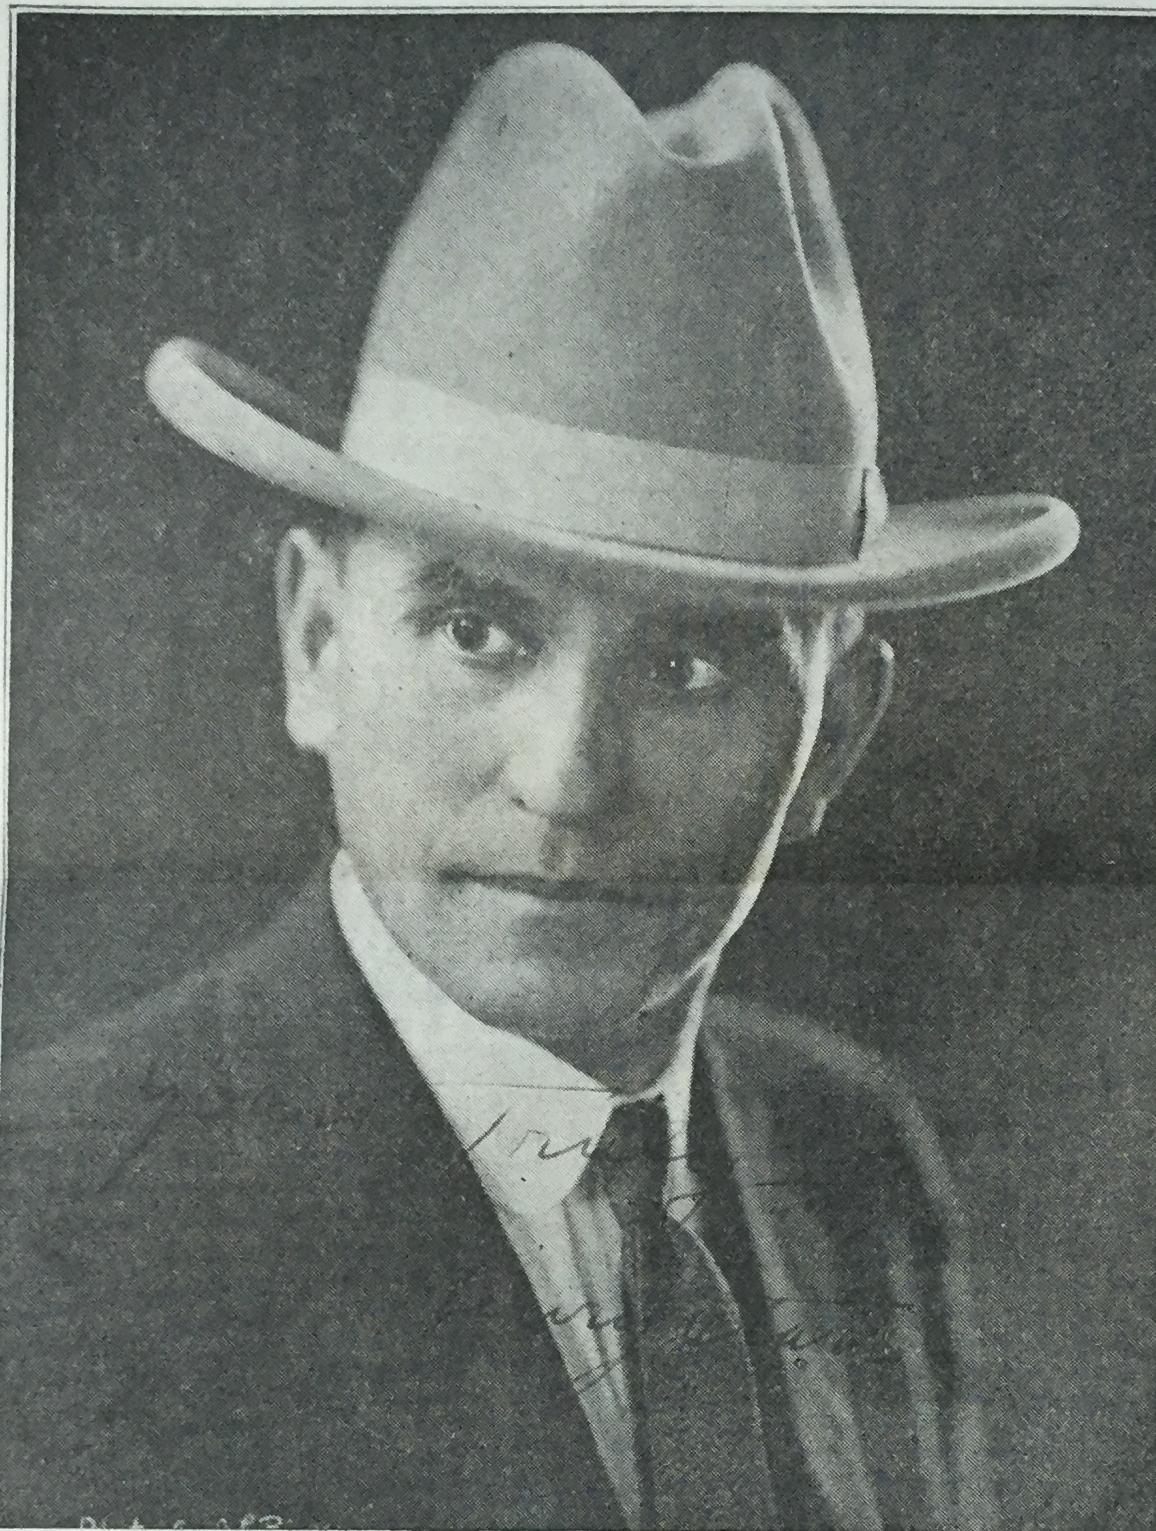 Henry Starr headshot